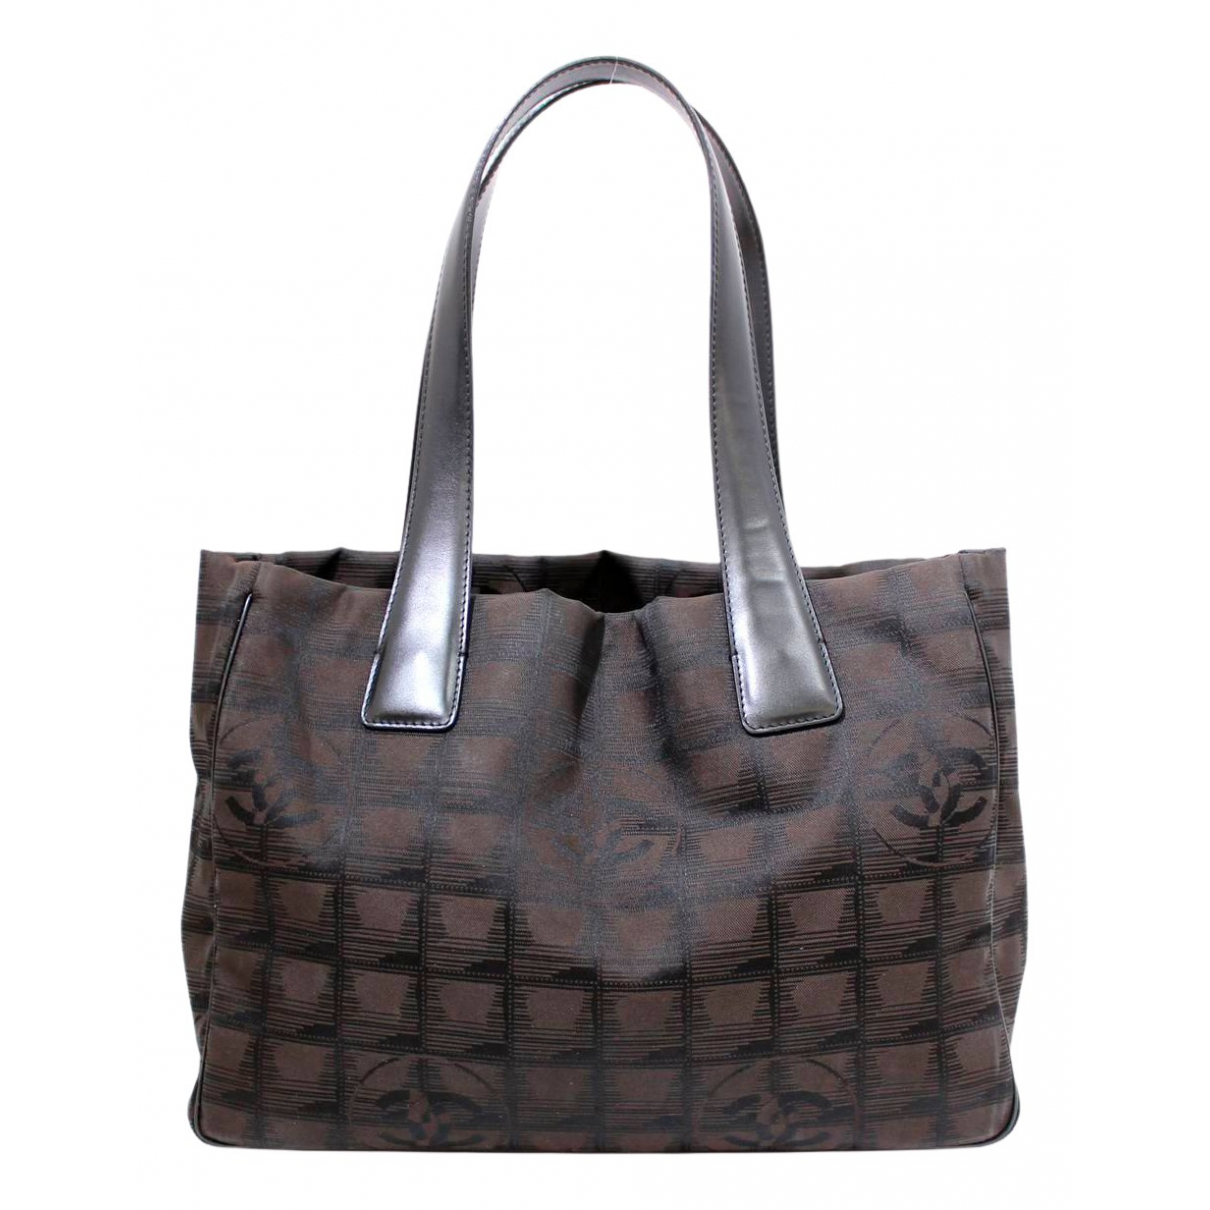 Chanel \N Brown Cloth handbag for Women \N